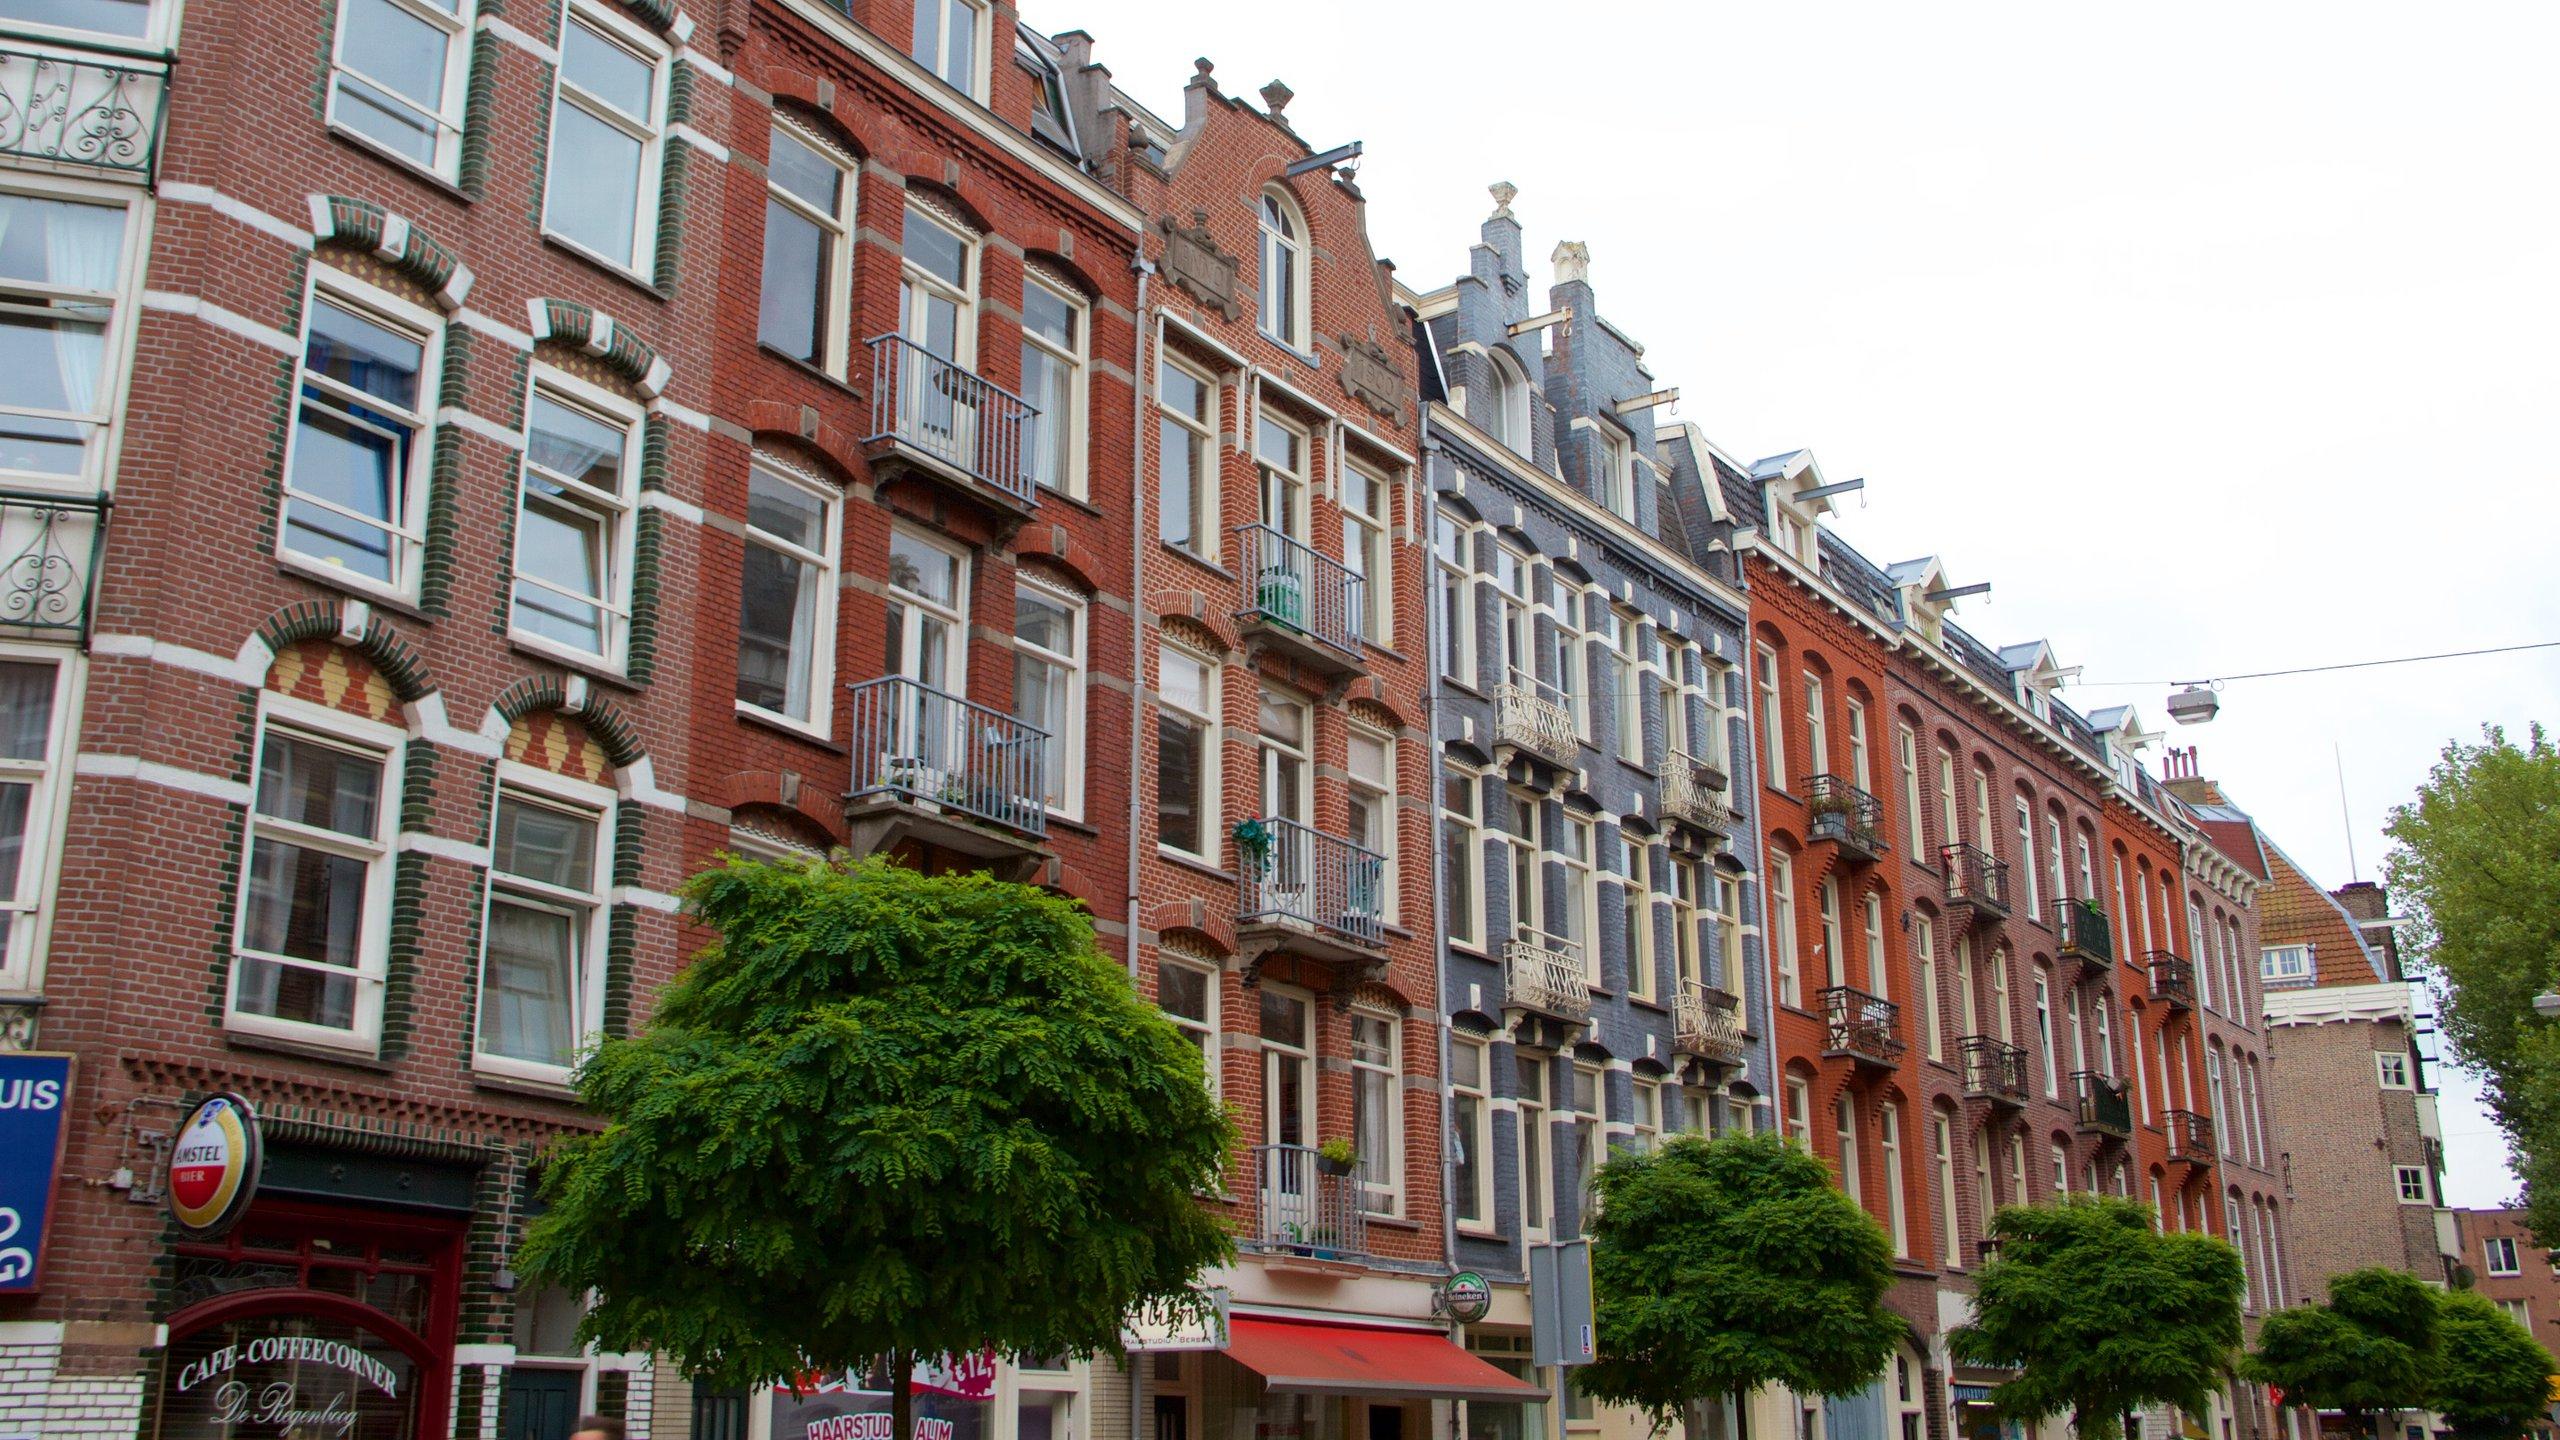 De Pijp, Amsterdam, North Holland, Netherlands